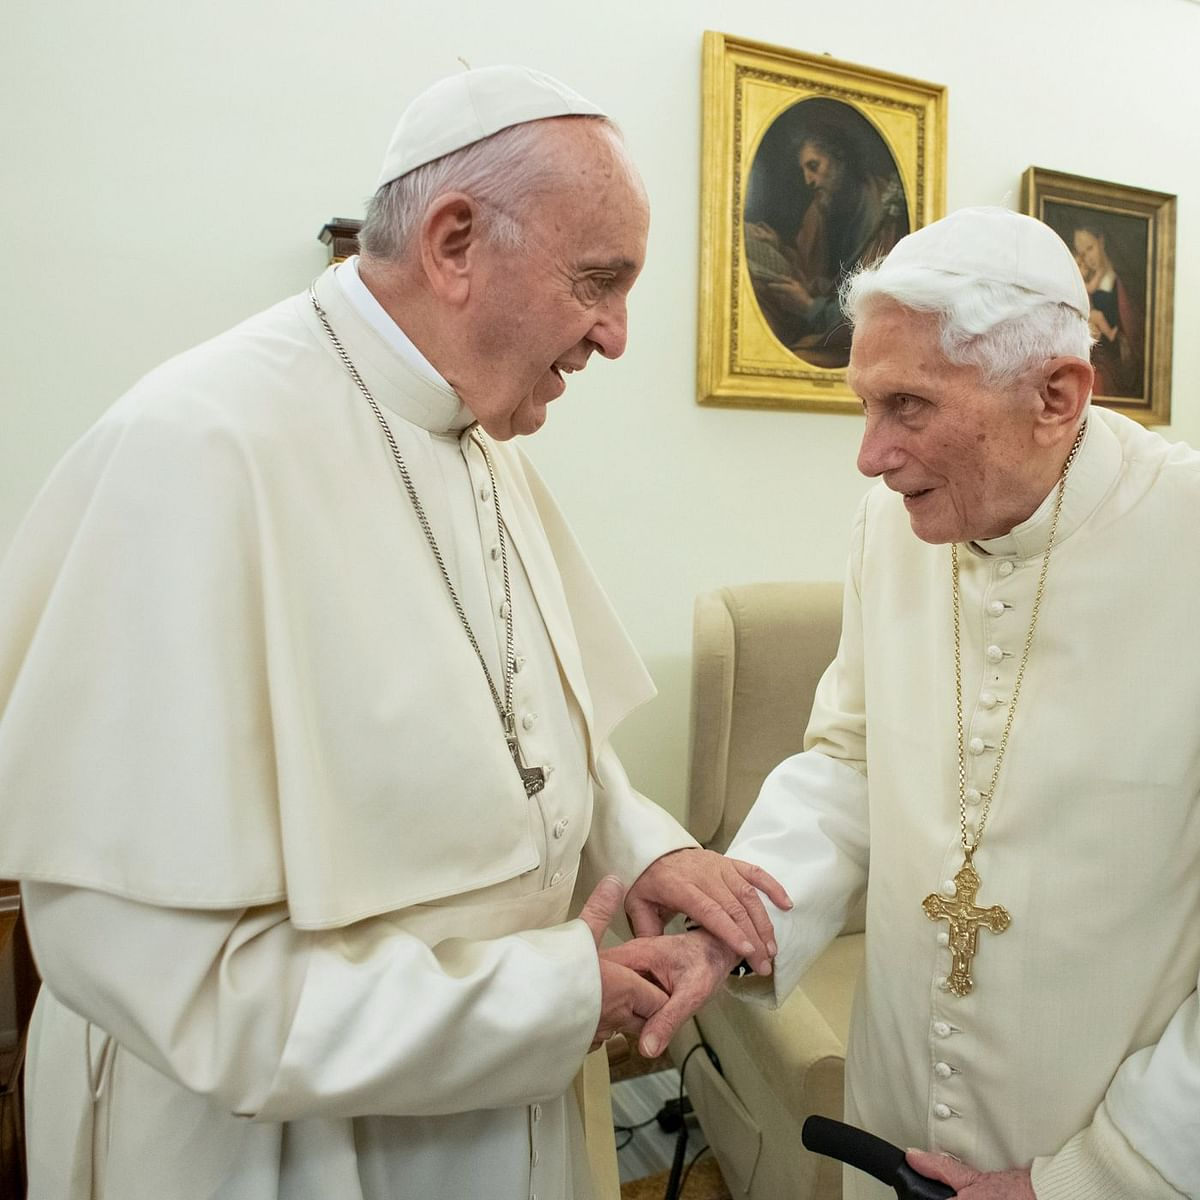 Ex-Pope Benedict XVI breaks silence over priest celibacy